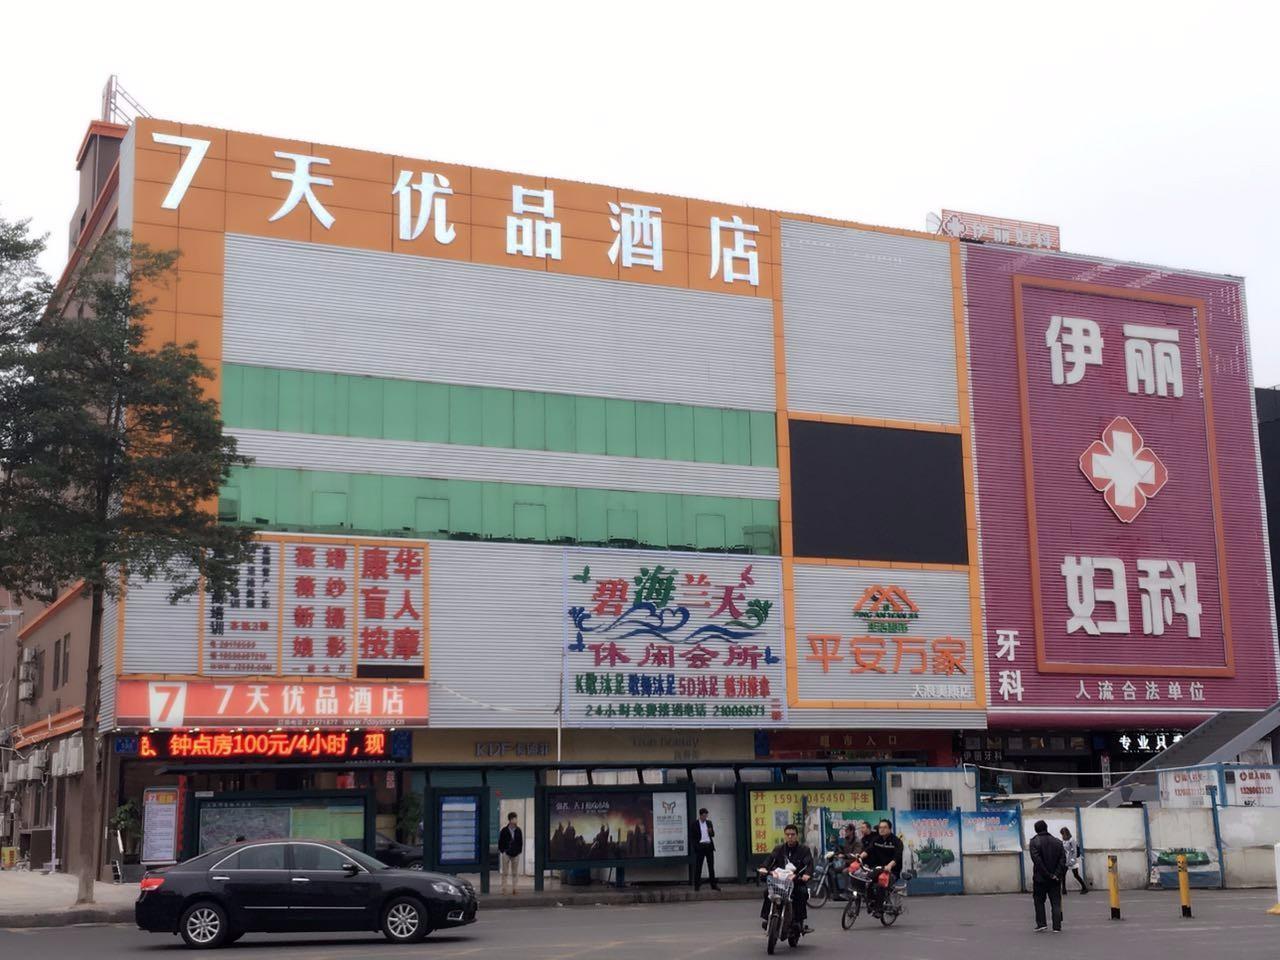 7Days Premium Shenzhen Dalang Commercial Center Branch